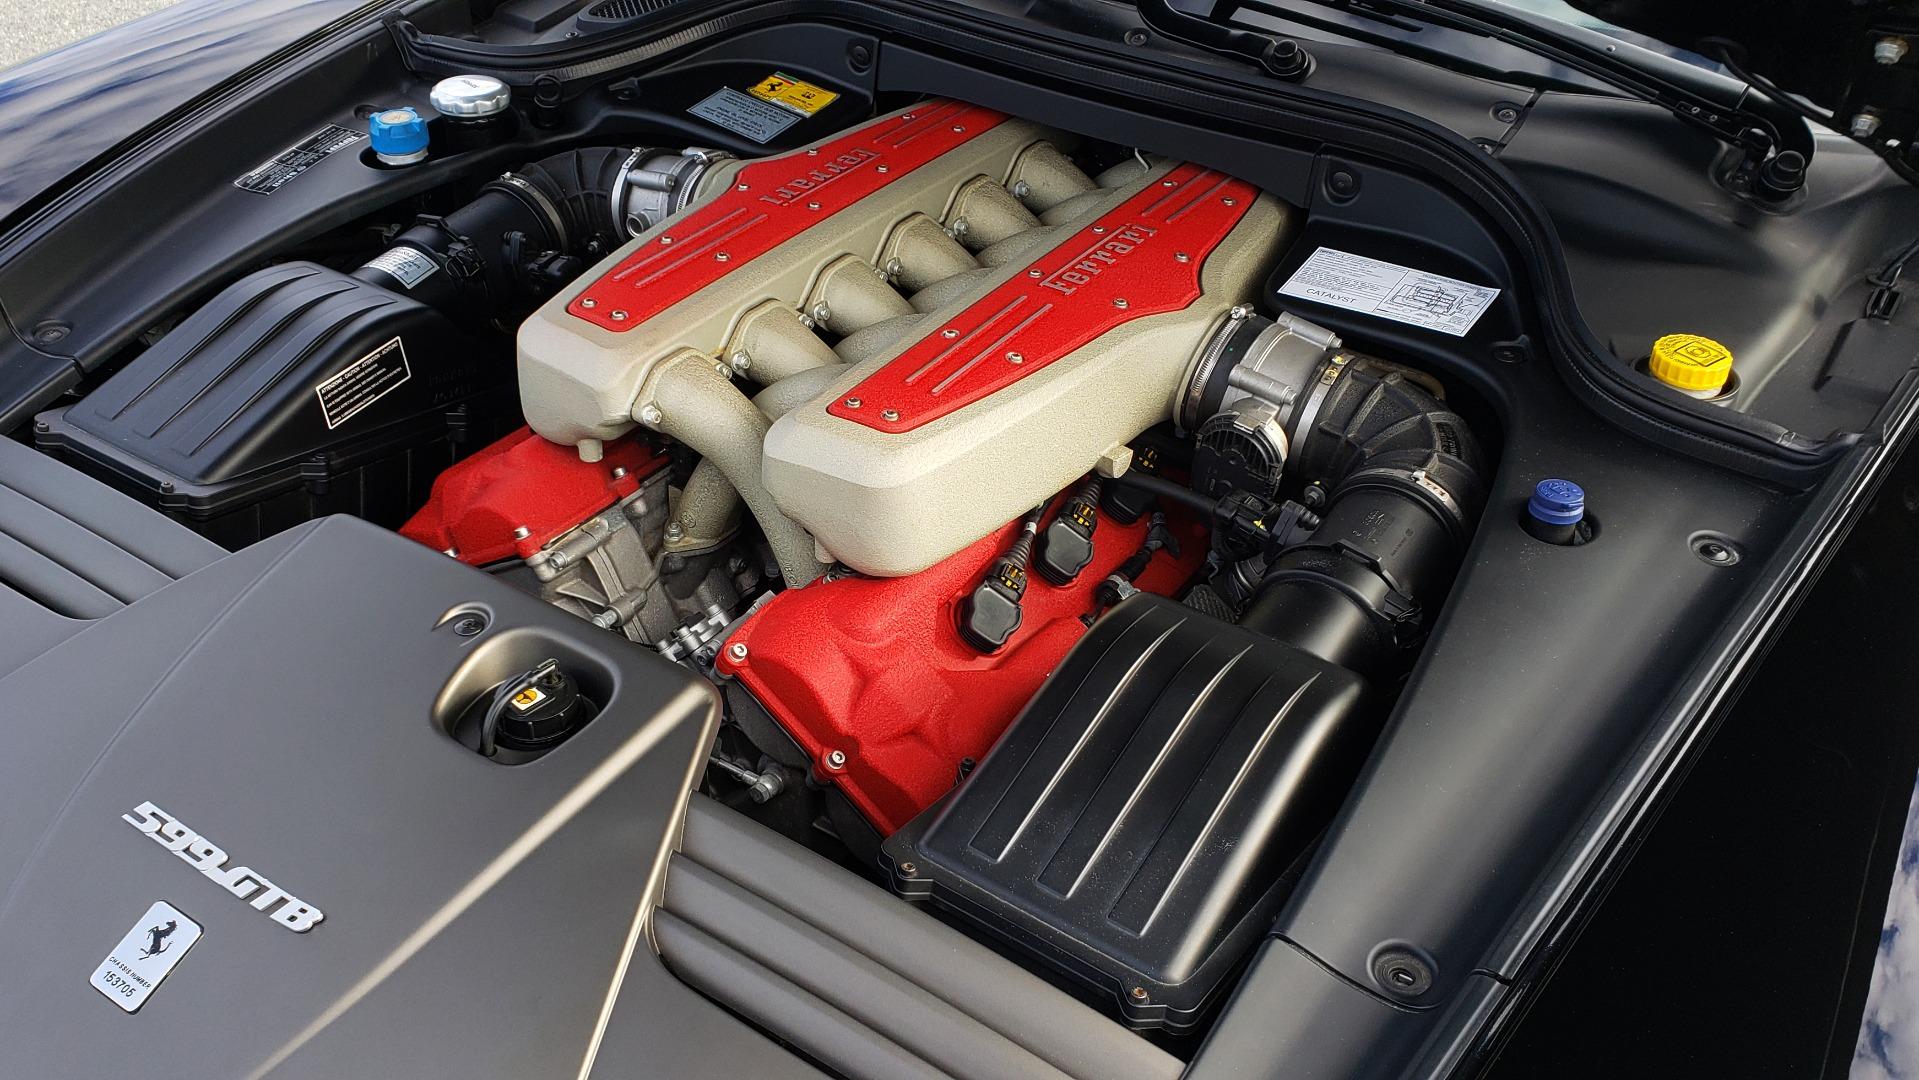 Used 2007 Ferrari 599 GTB FIORANO HGTE / V12 / F1 TRANS / NAV / BOSE / CUSTOM WHEELS for sale $109,999 at Formula Imports in Charlotte NC 28227 60